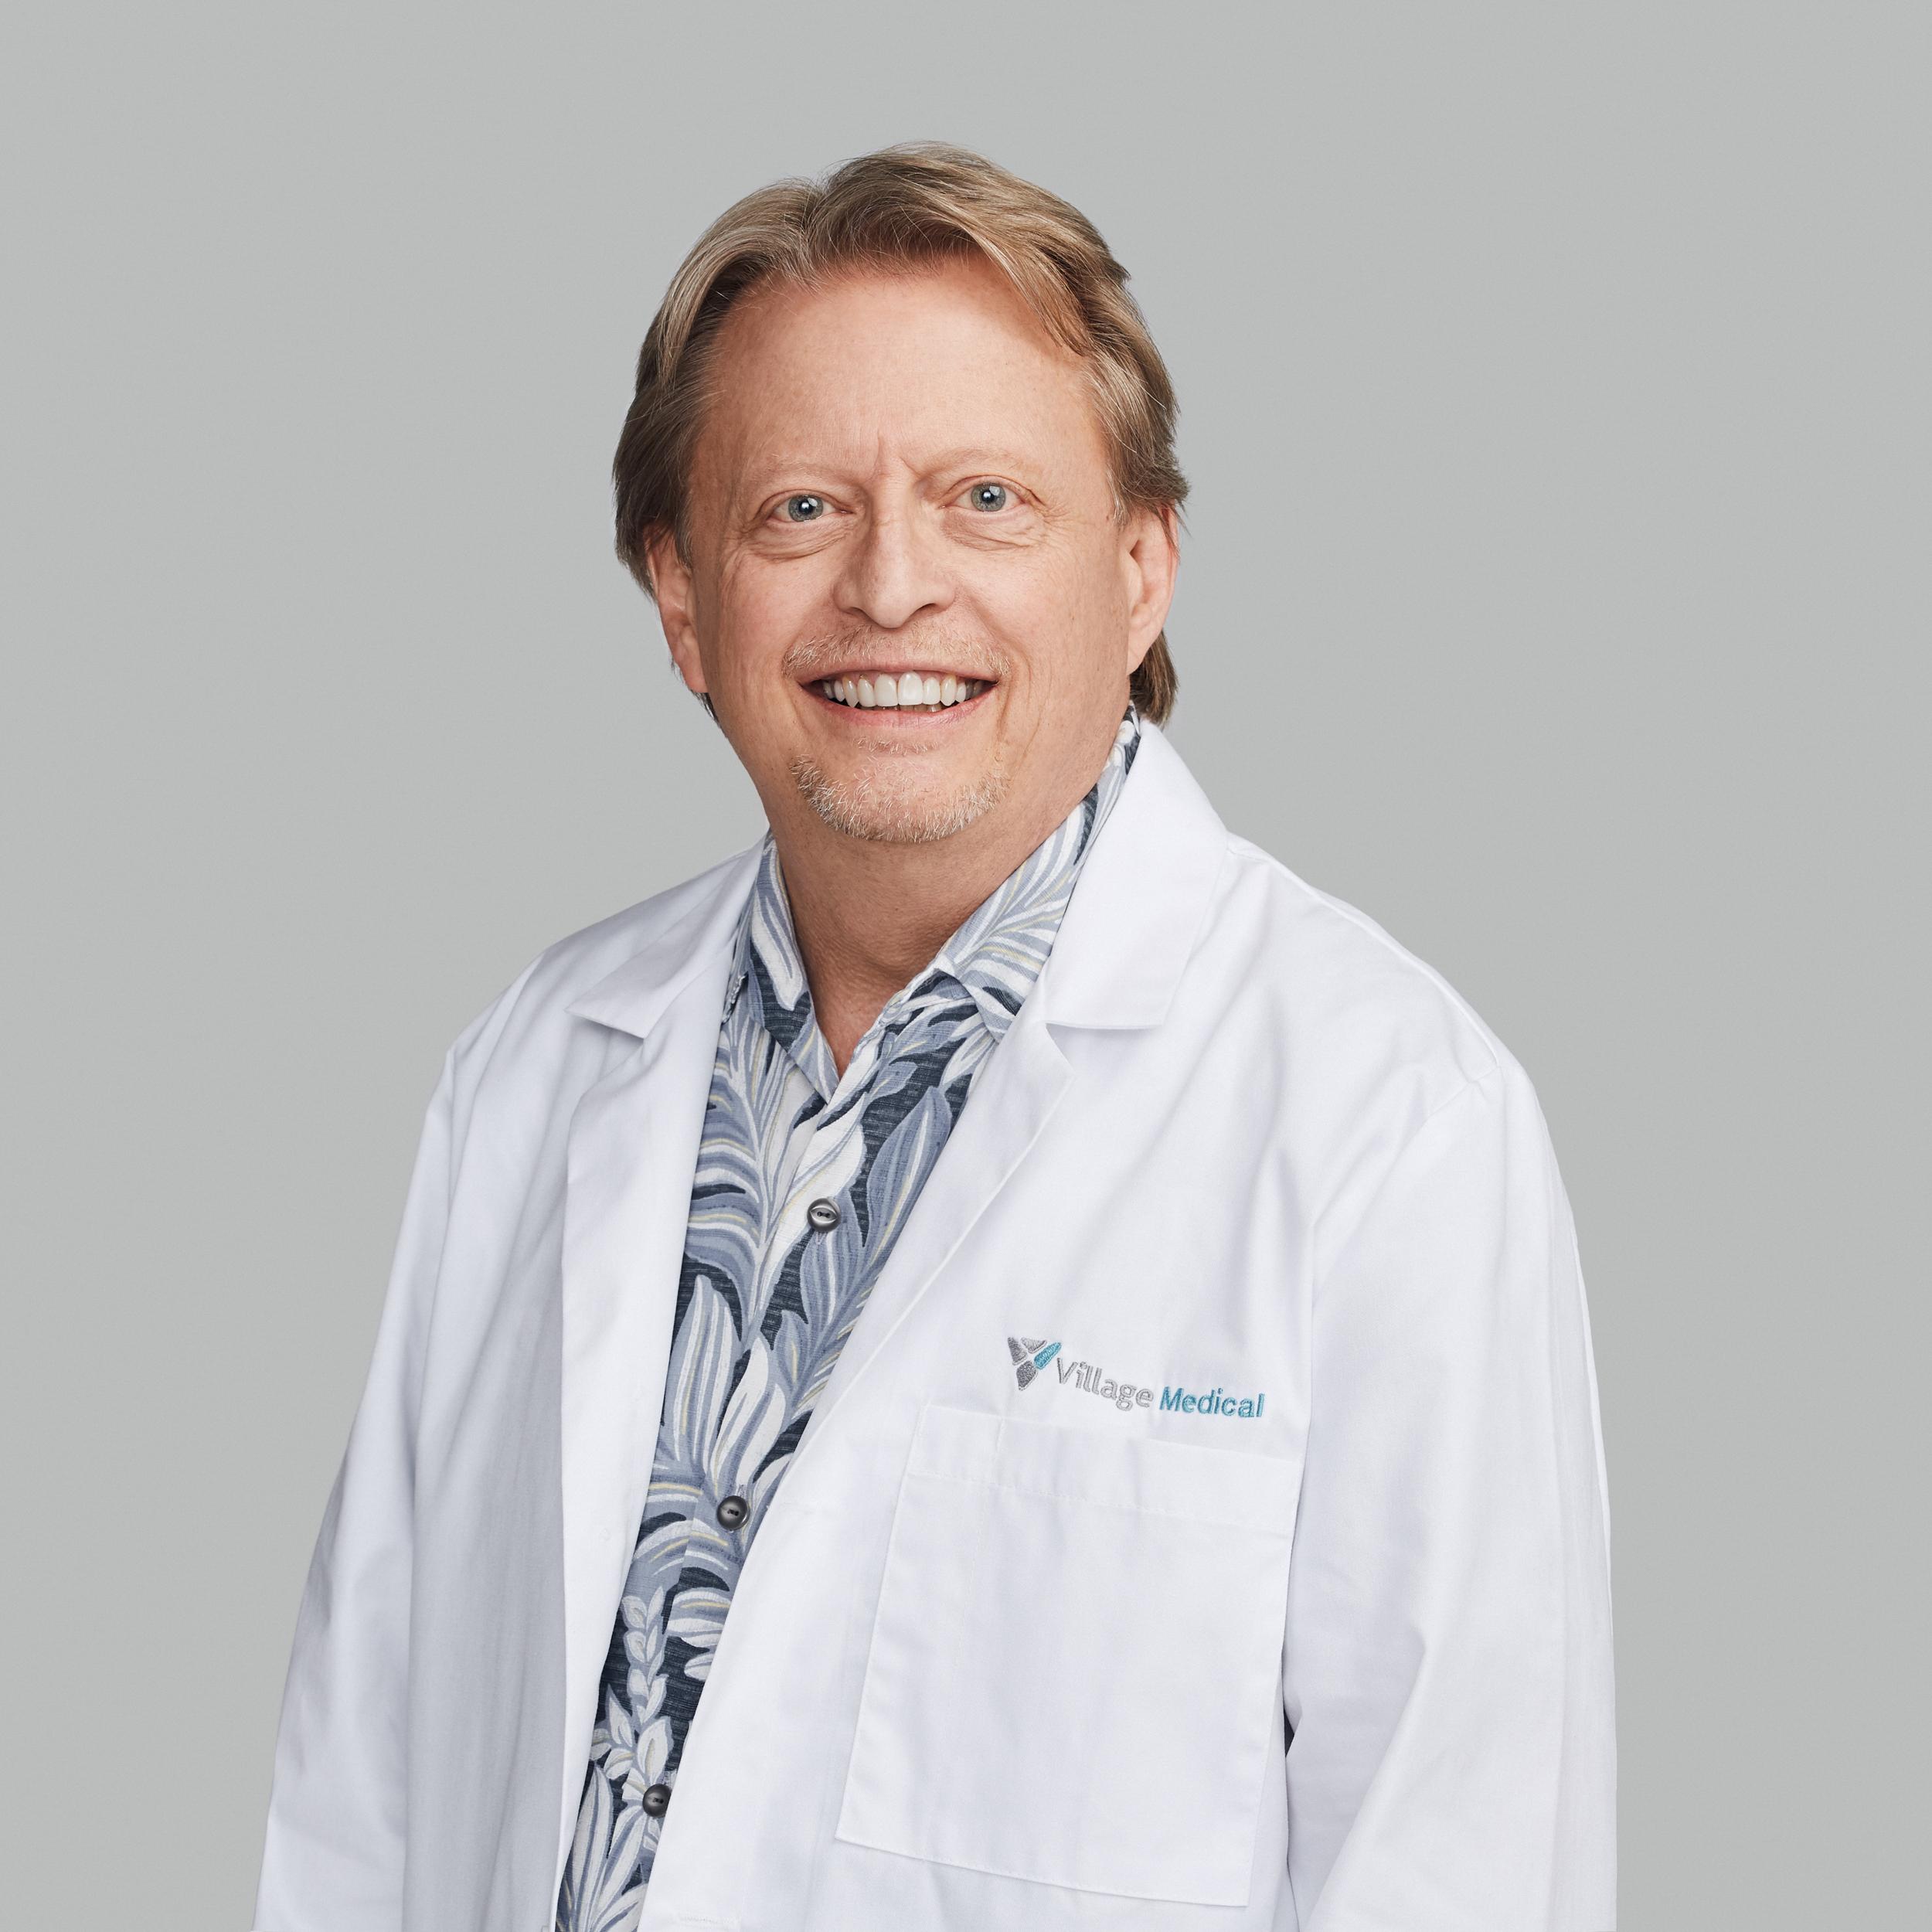 Thomas Habiger, MD